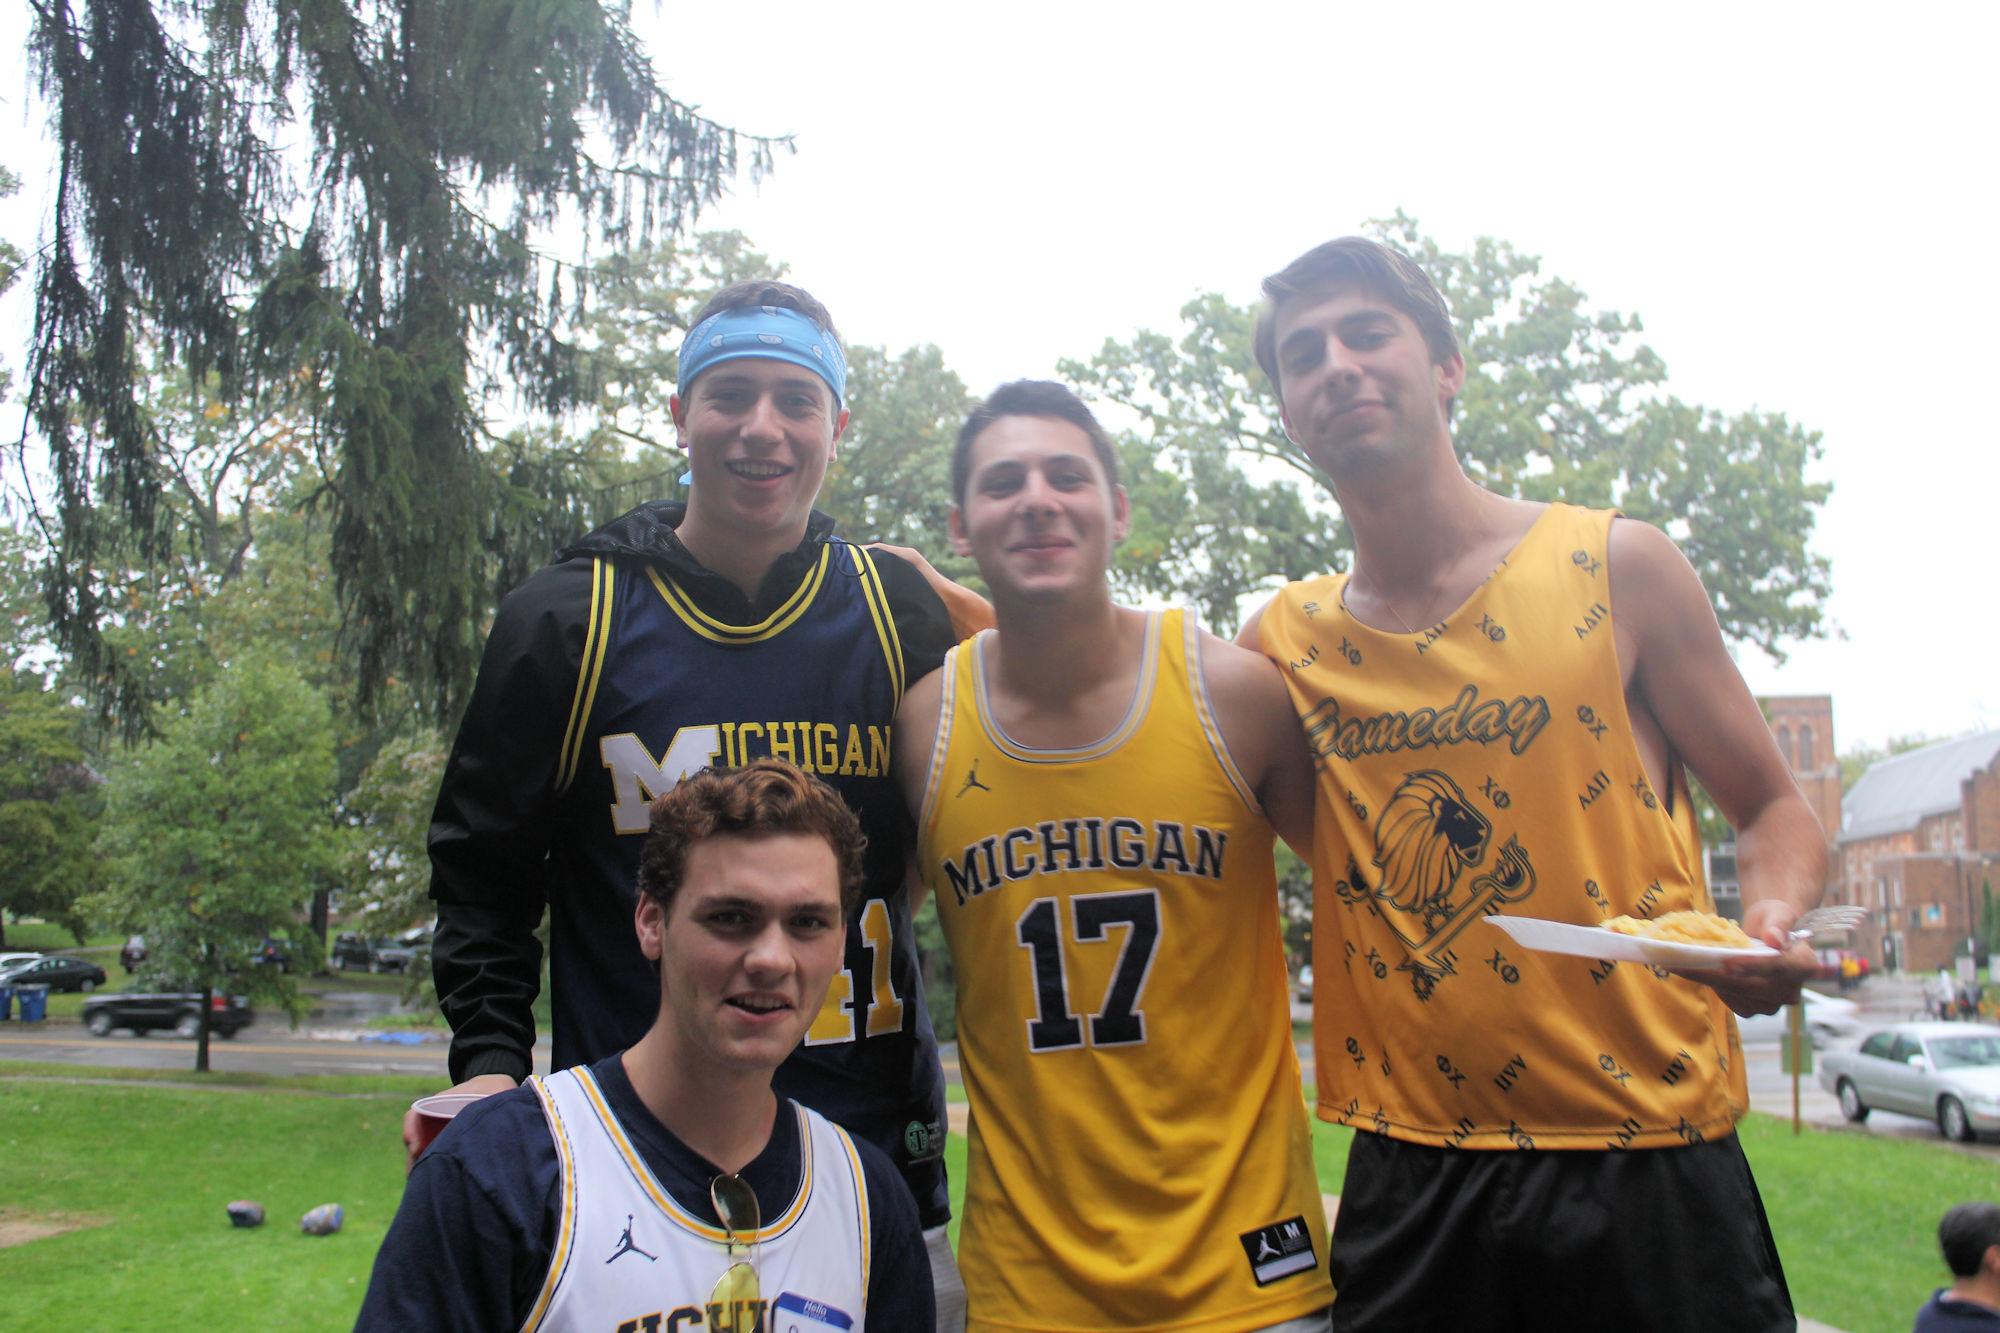 (L to R) Top Row: Zach Piell ('21), Sam Jaffe ('21), Michael Uglietta ('21). Bottom Row: Ryan Borchardt ('21)